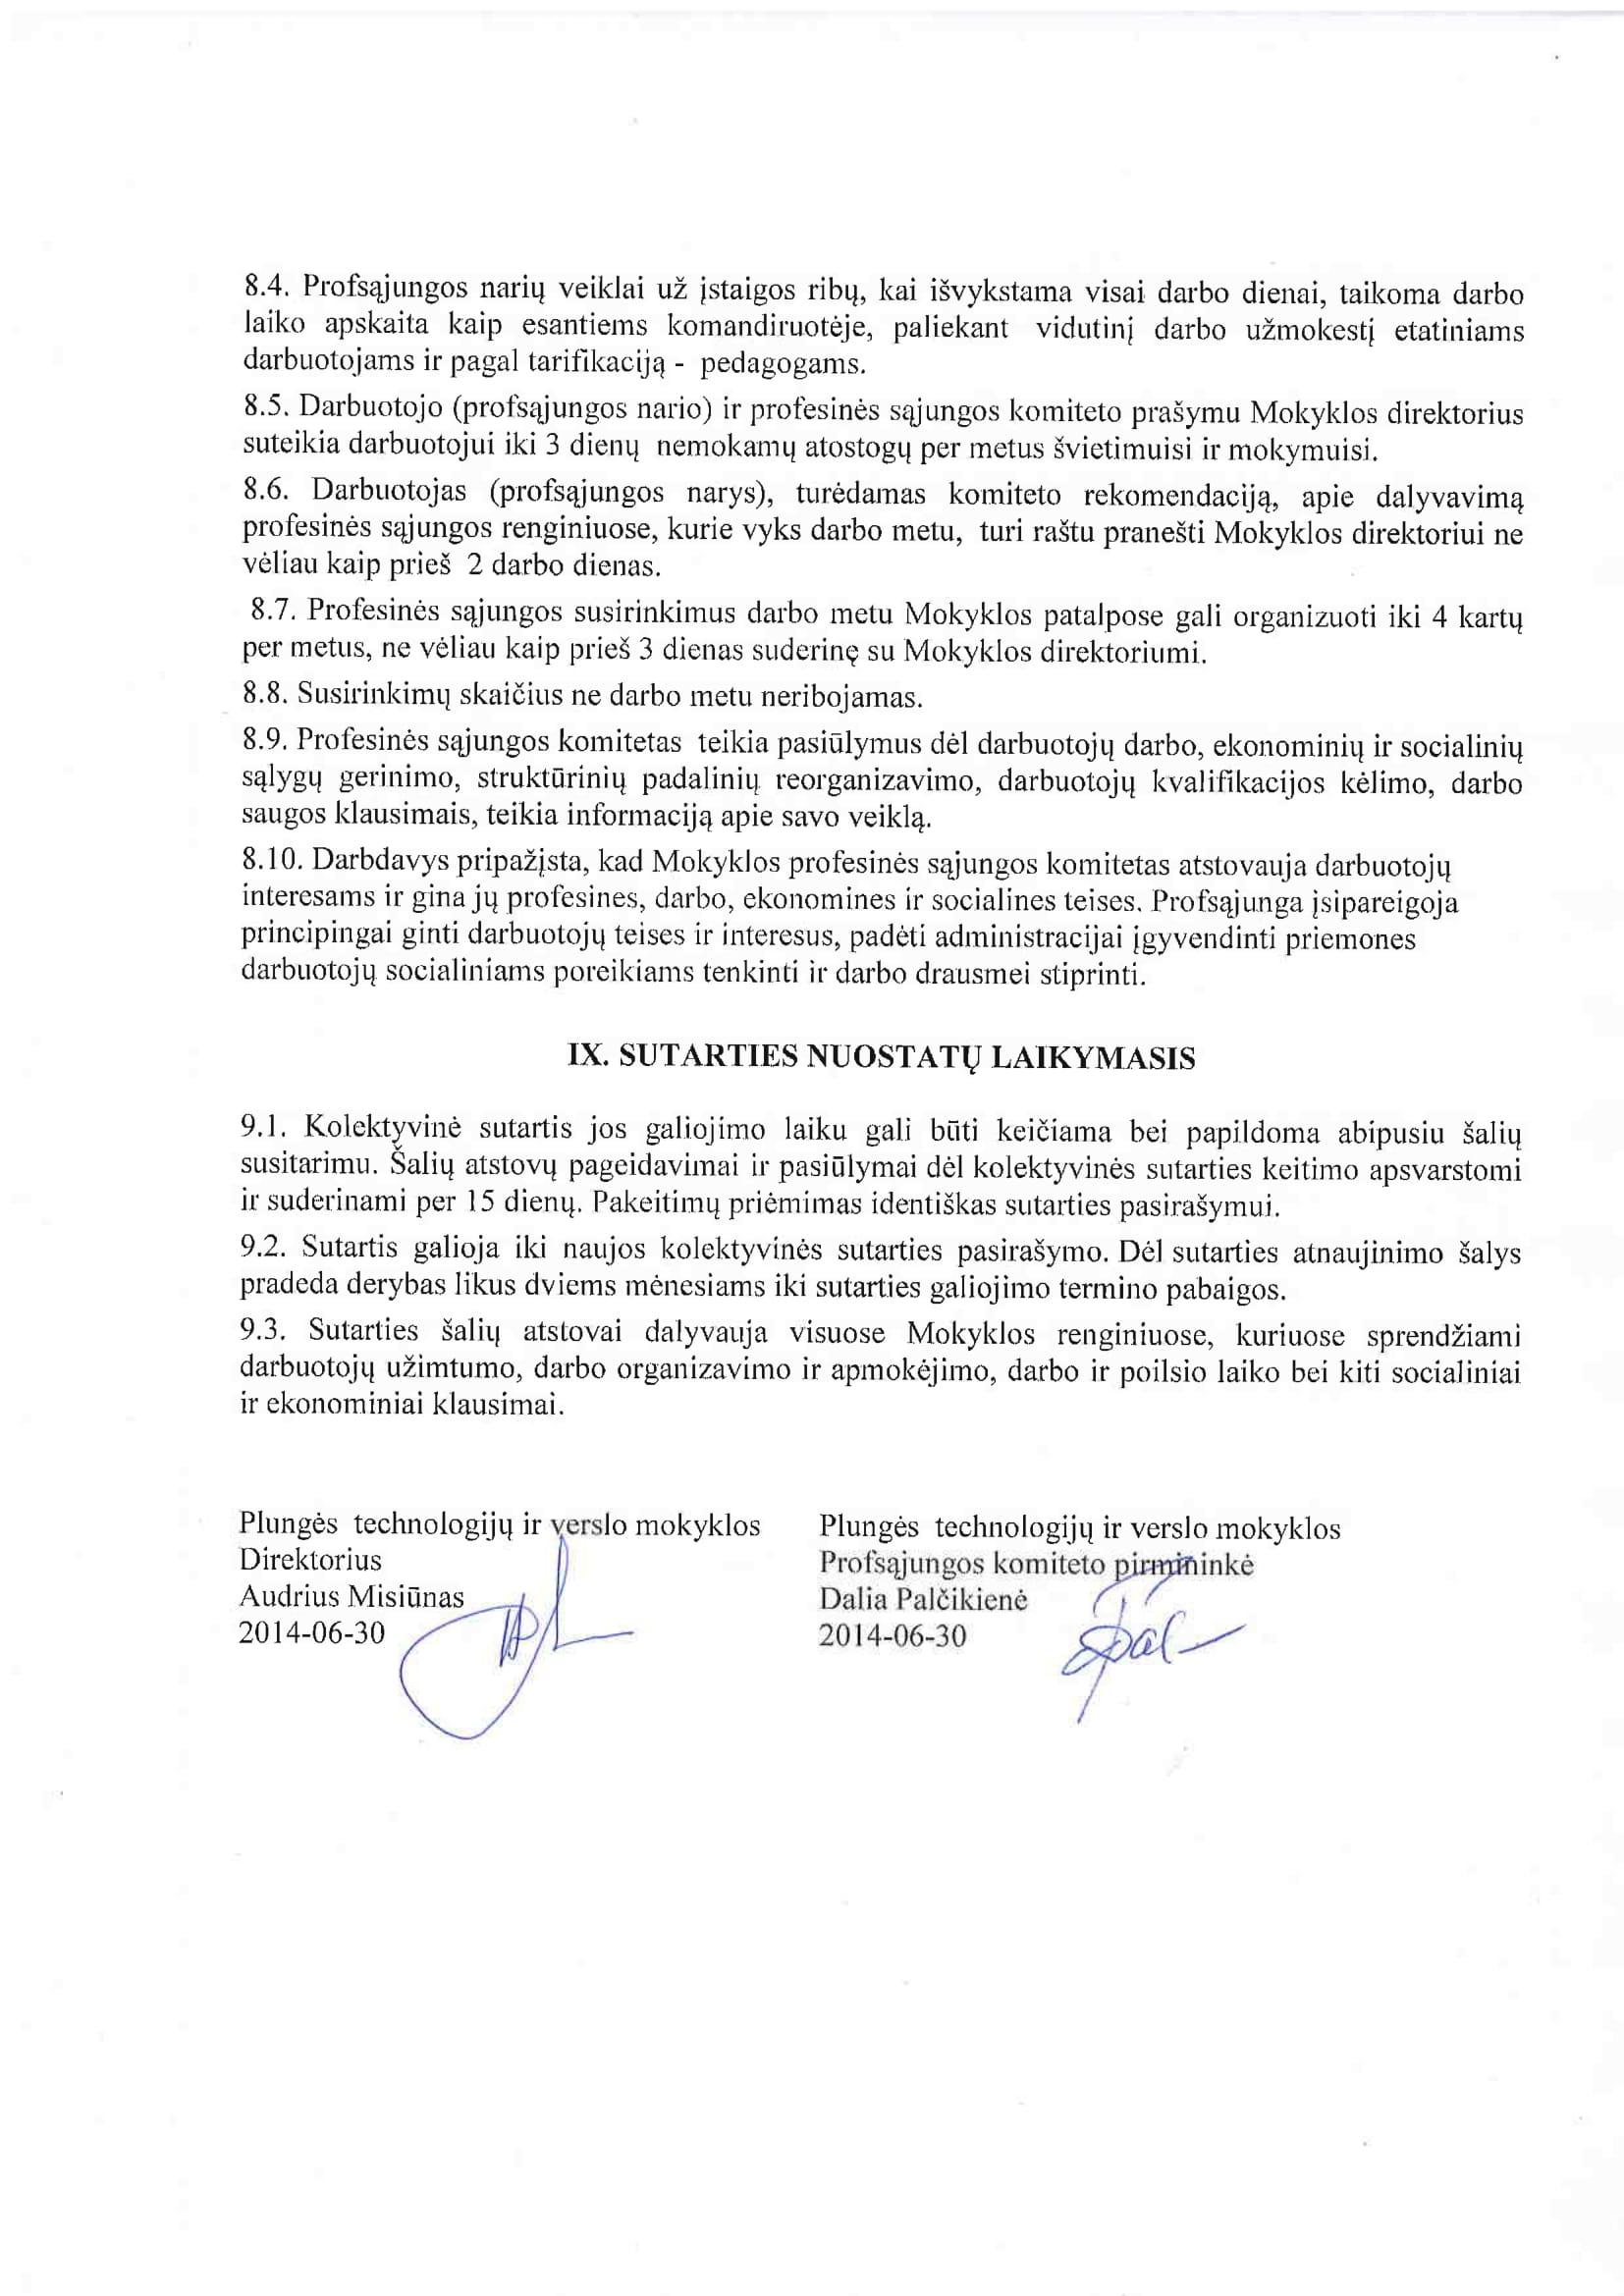 kolektyvine_sutartis-6